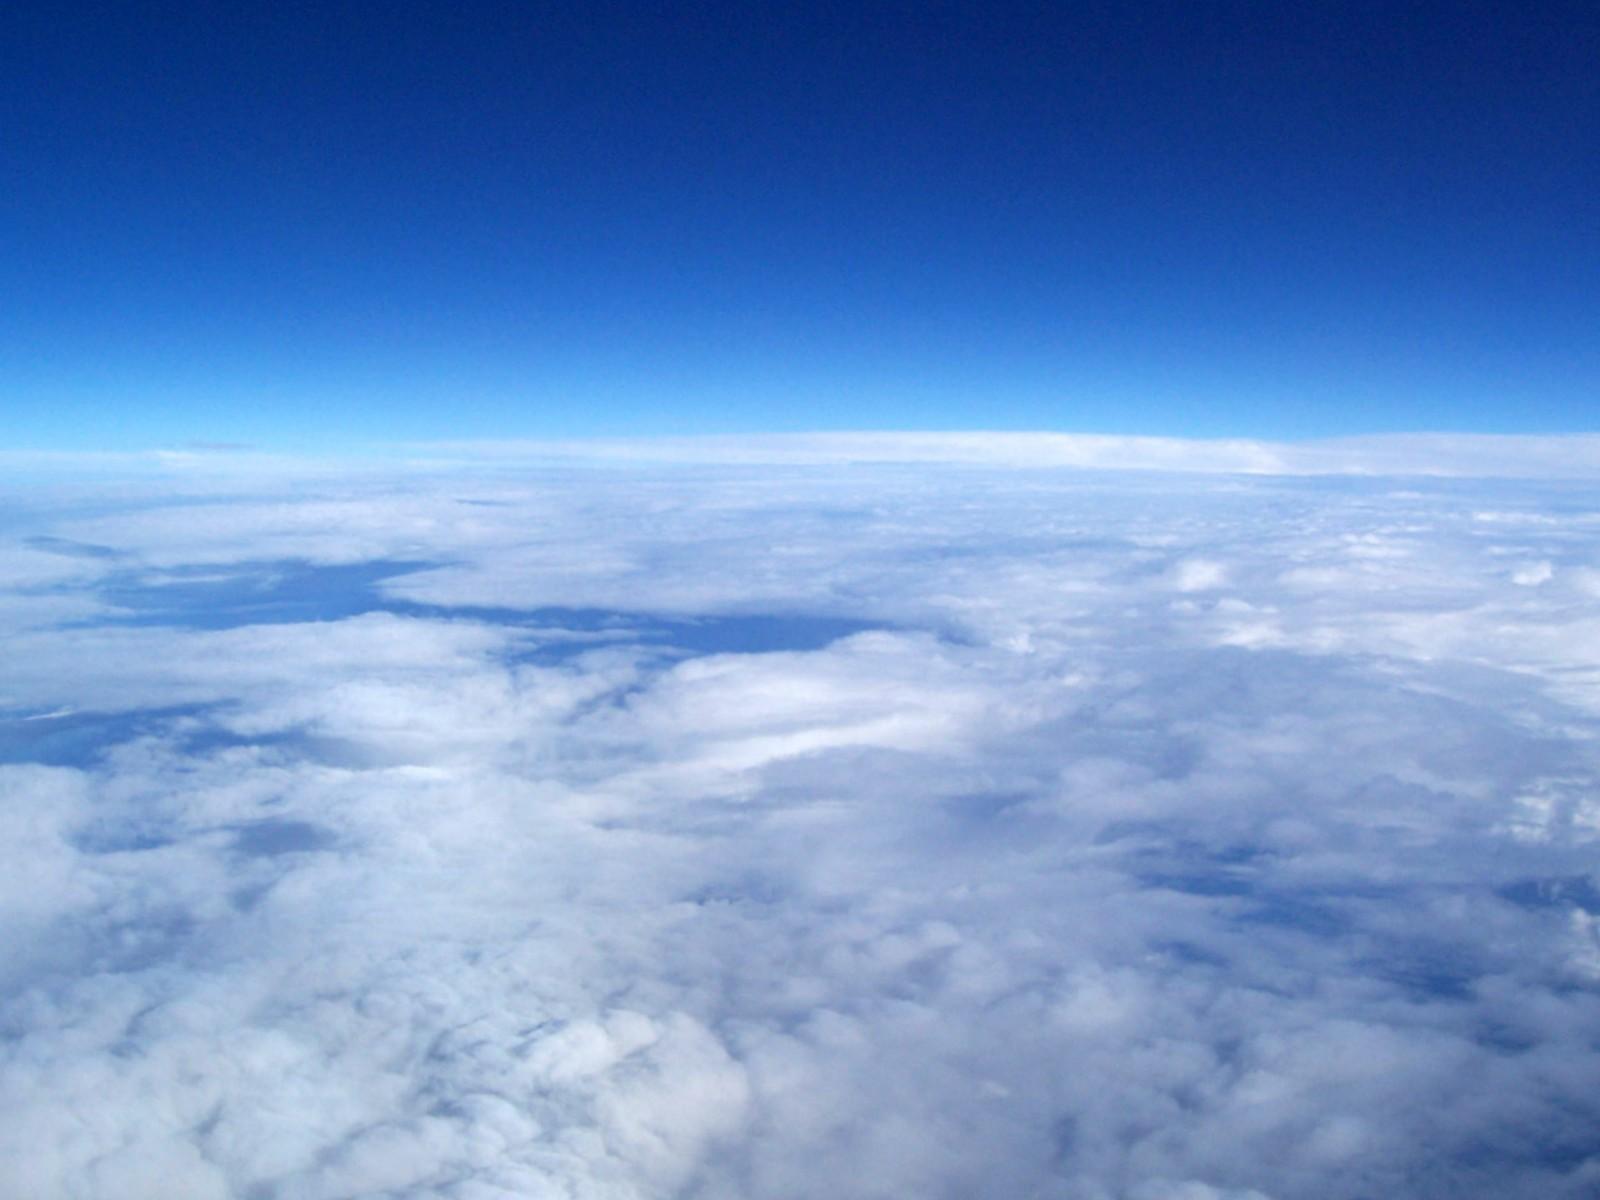 Beautiful Wallpapers For Desktop sky cloud wallpapers hd 1600x1200